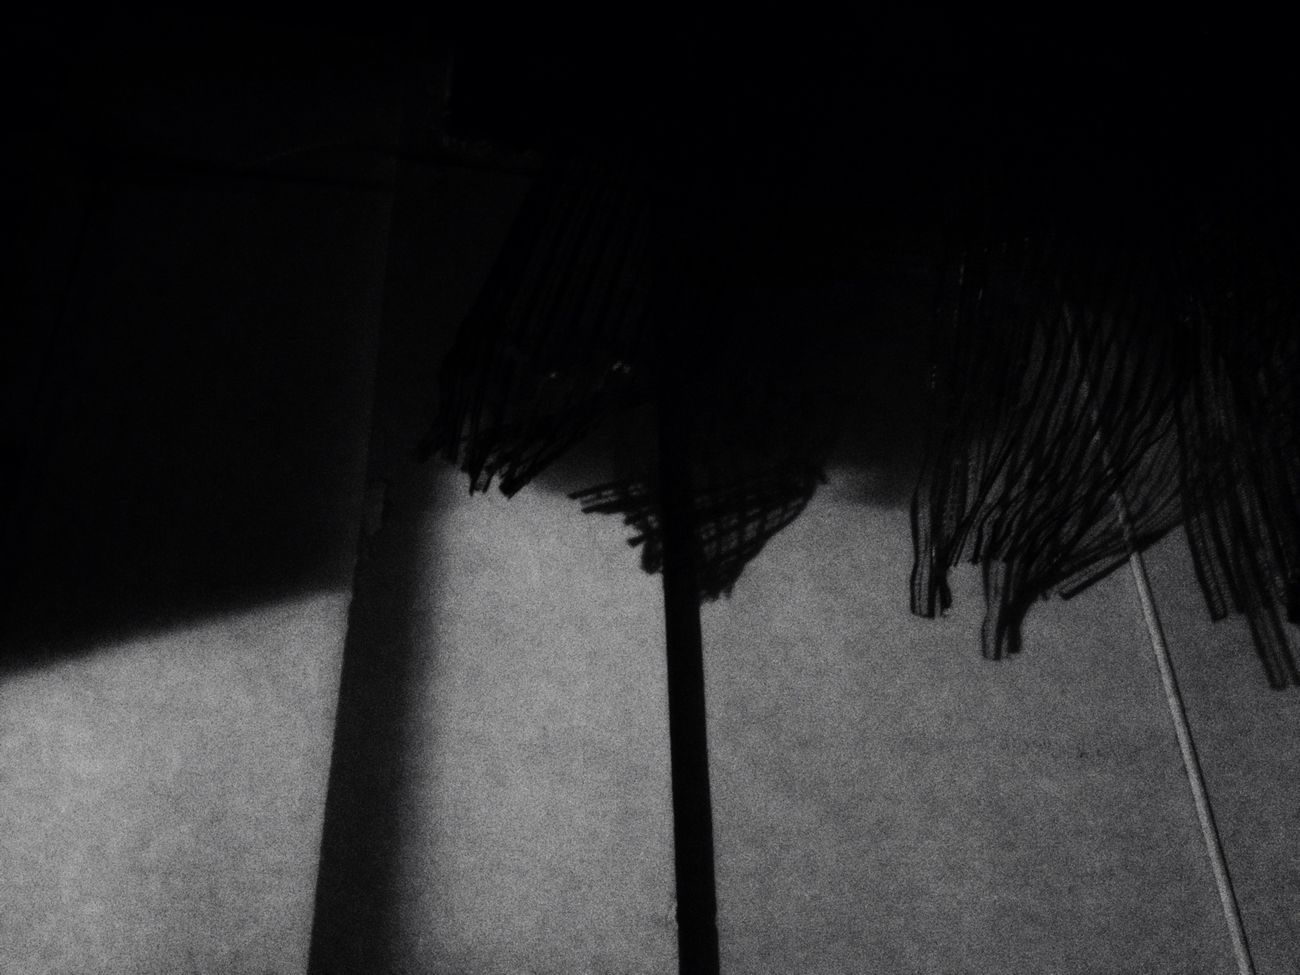 Blackandwhite Abstract